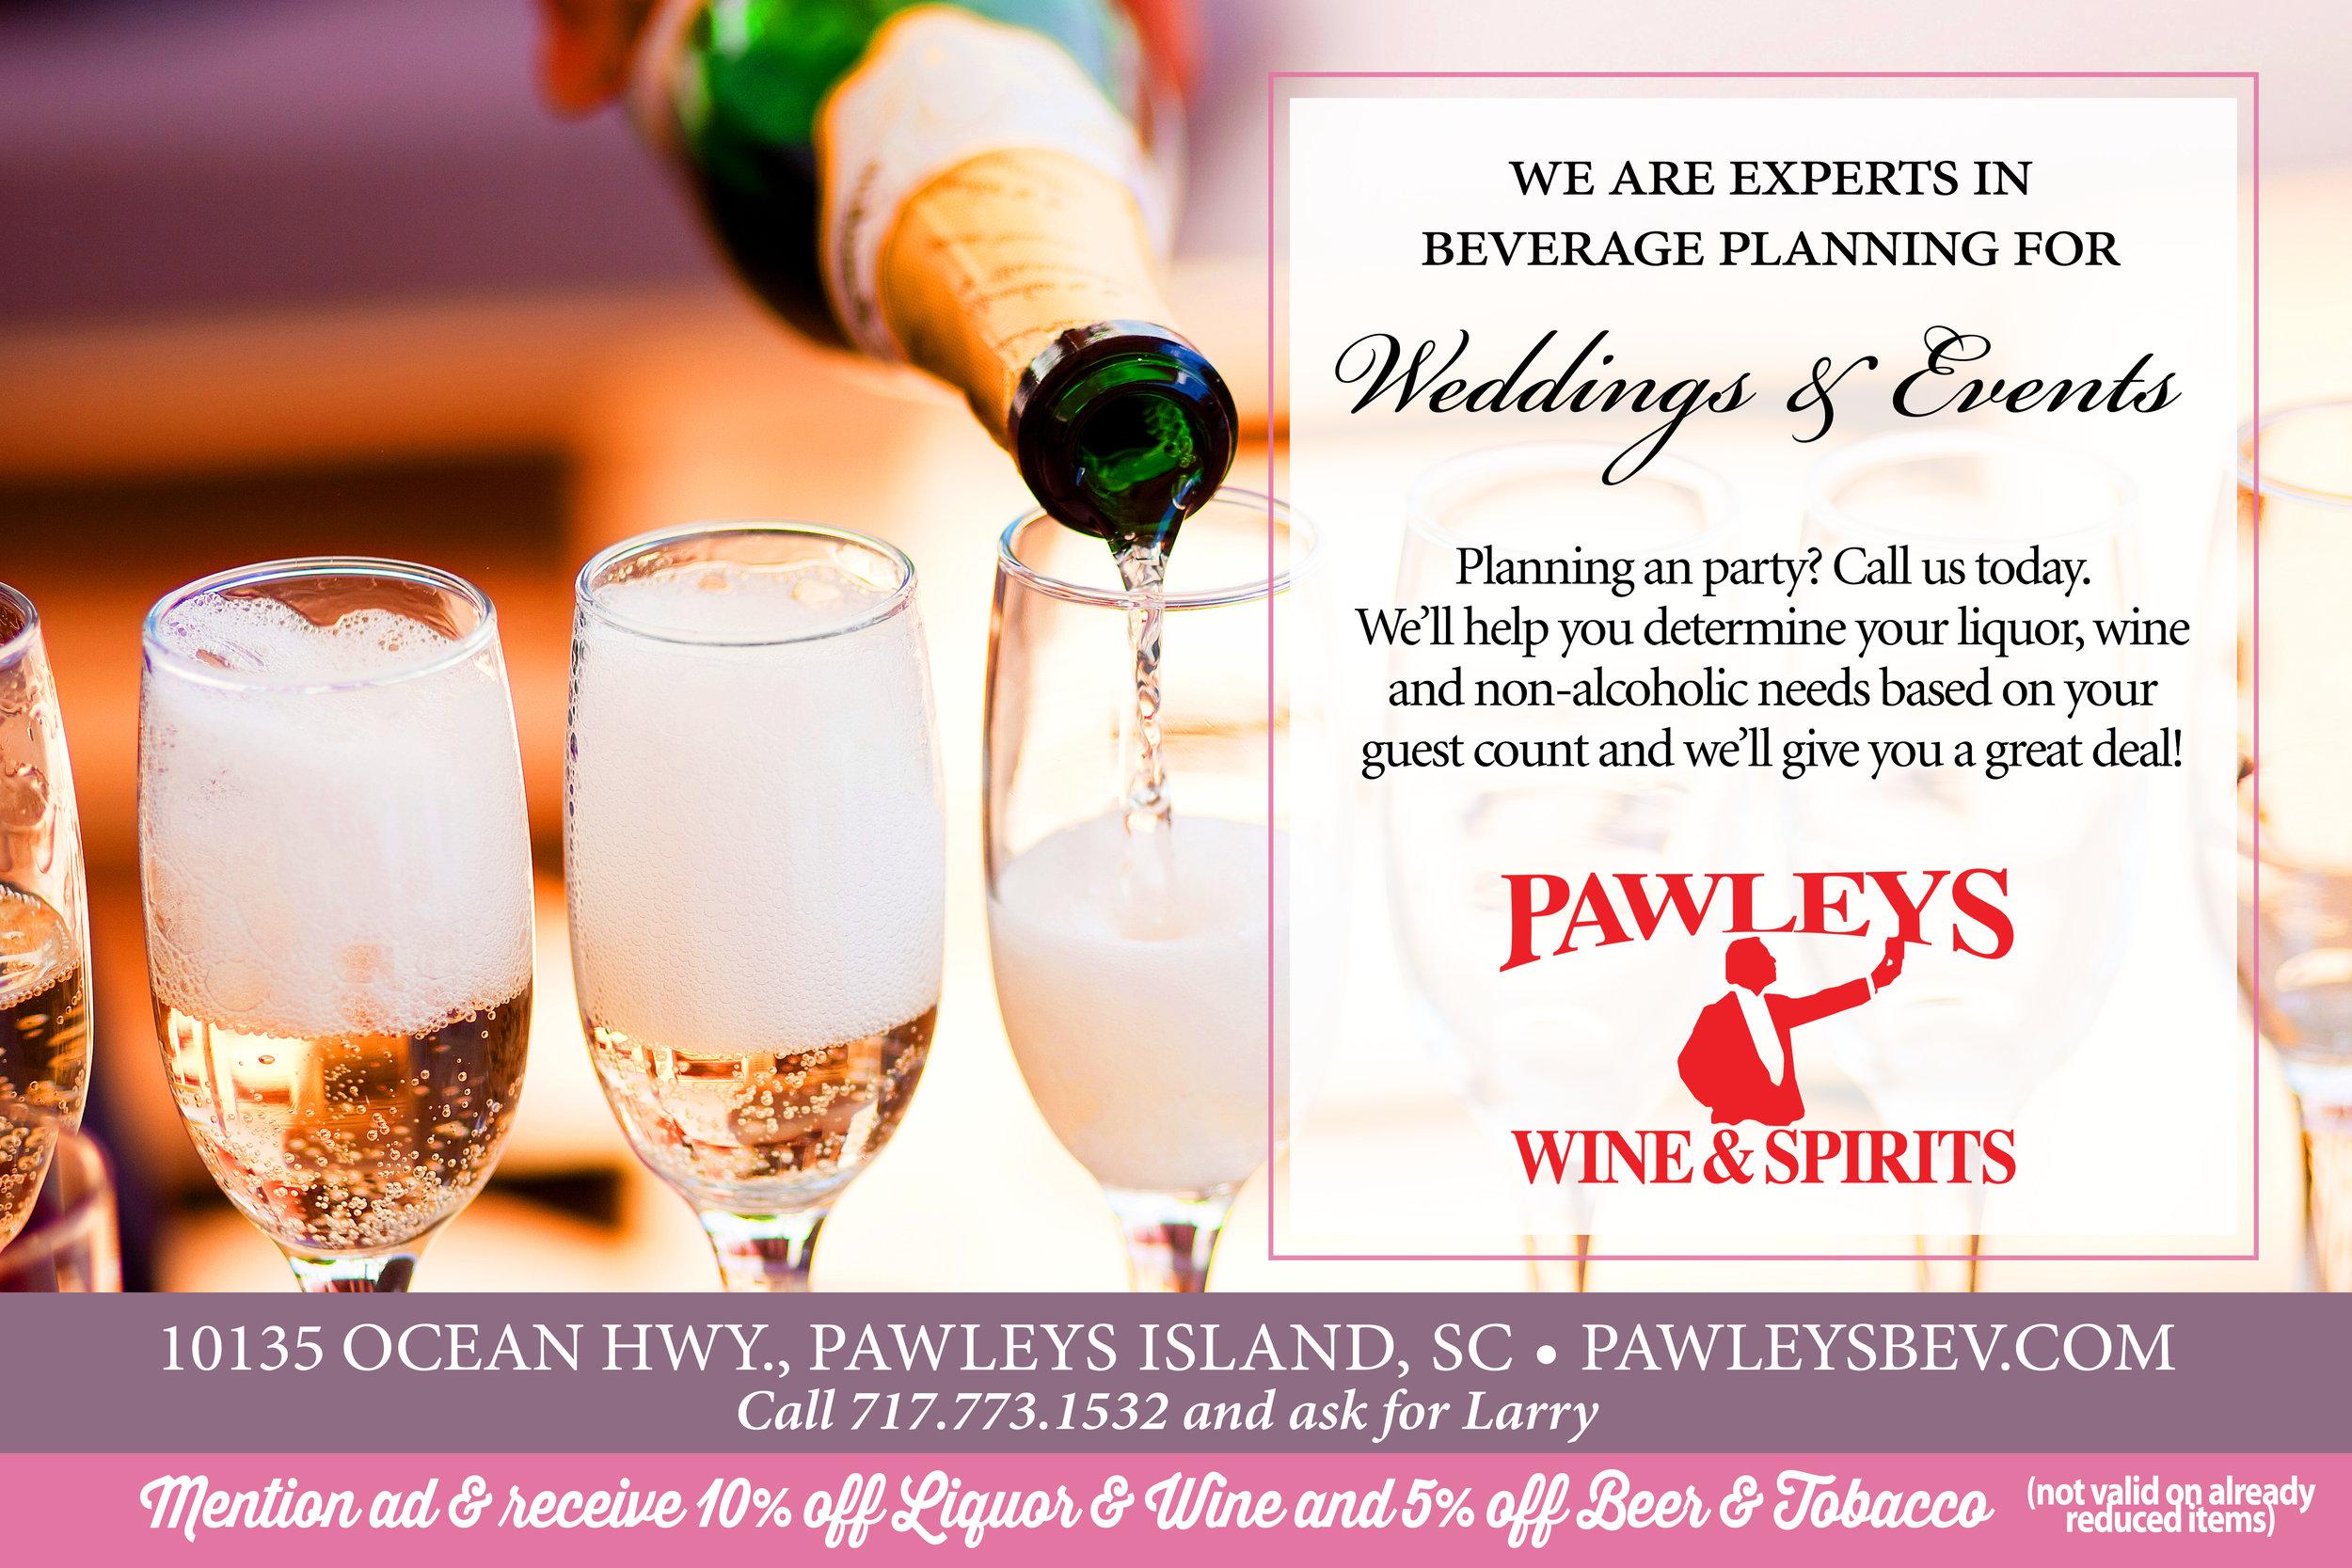 sc destination wedding ad.jpg